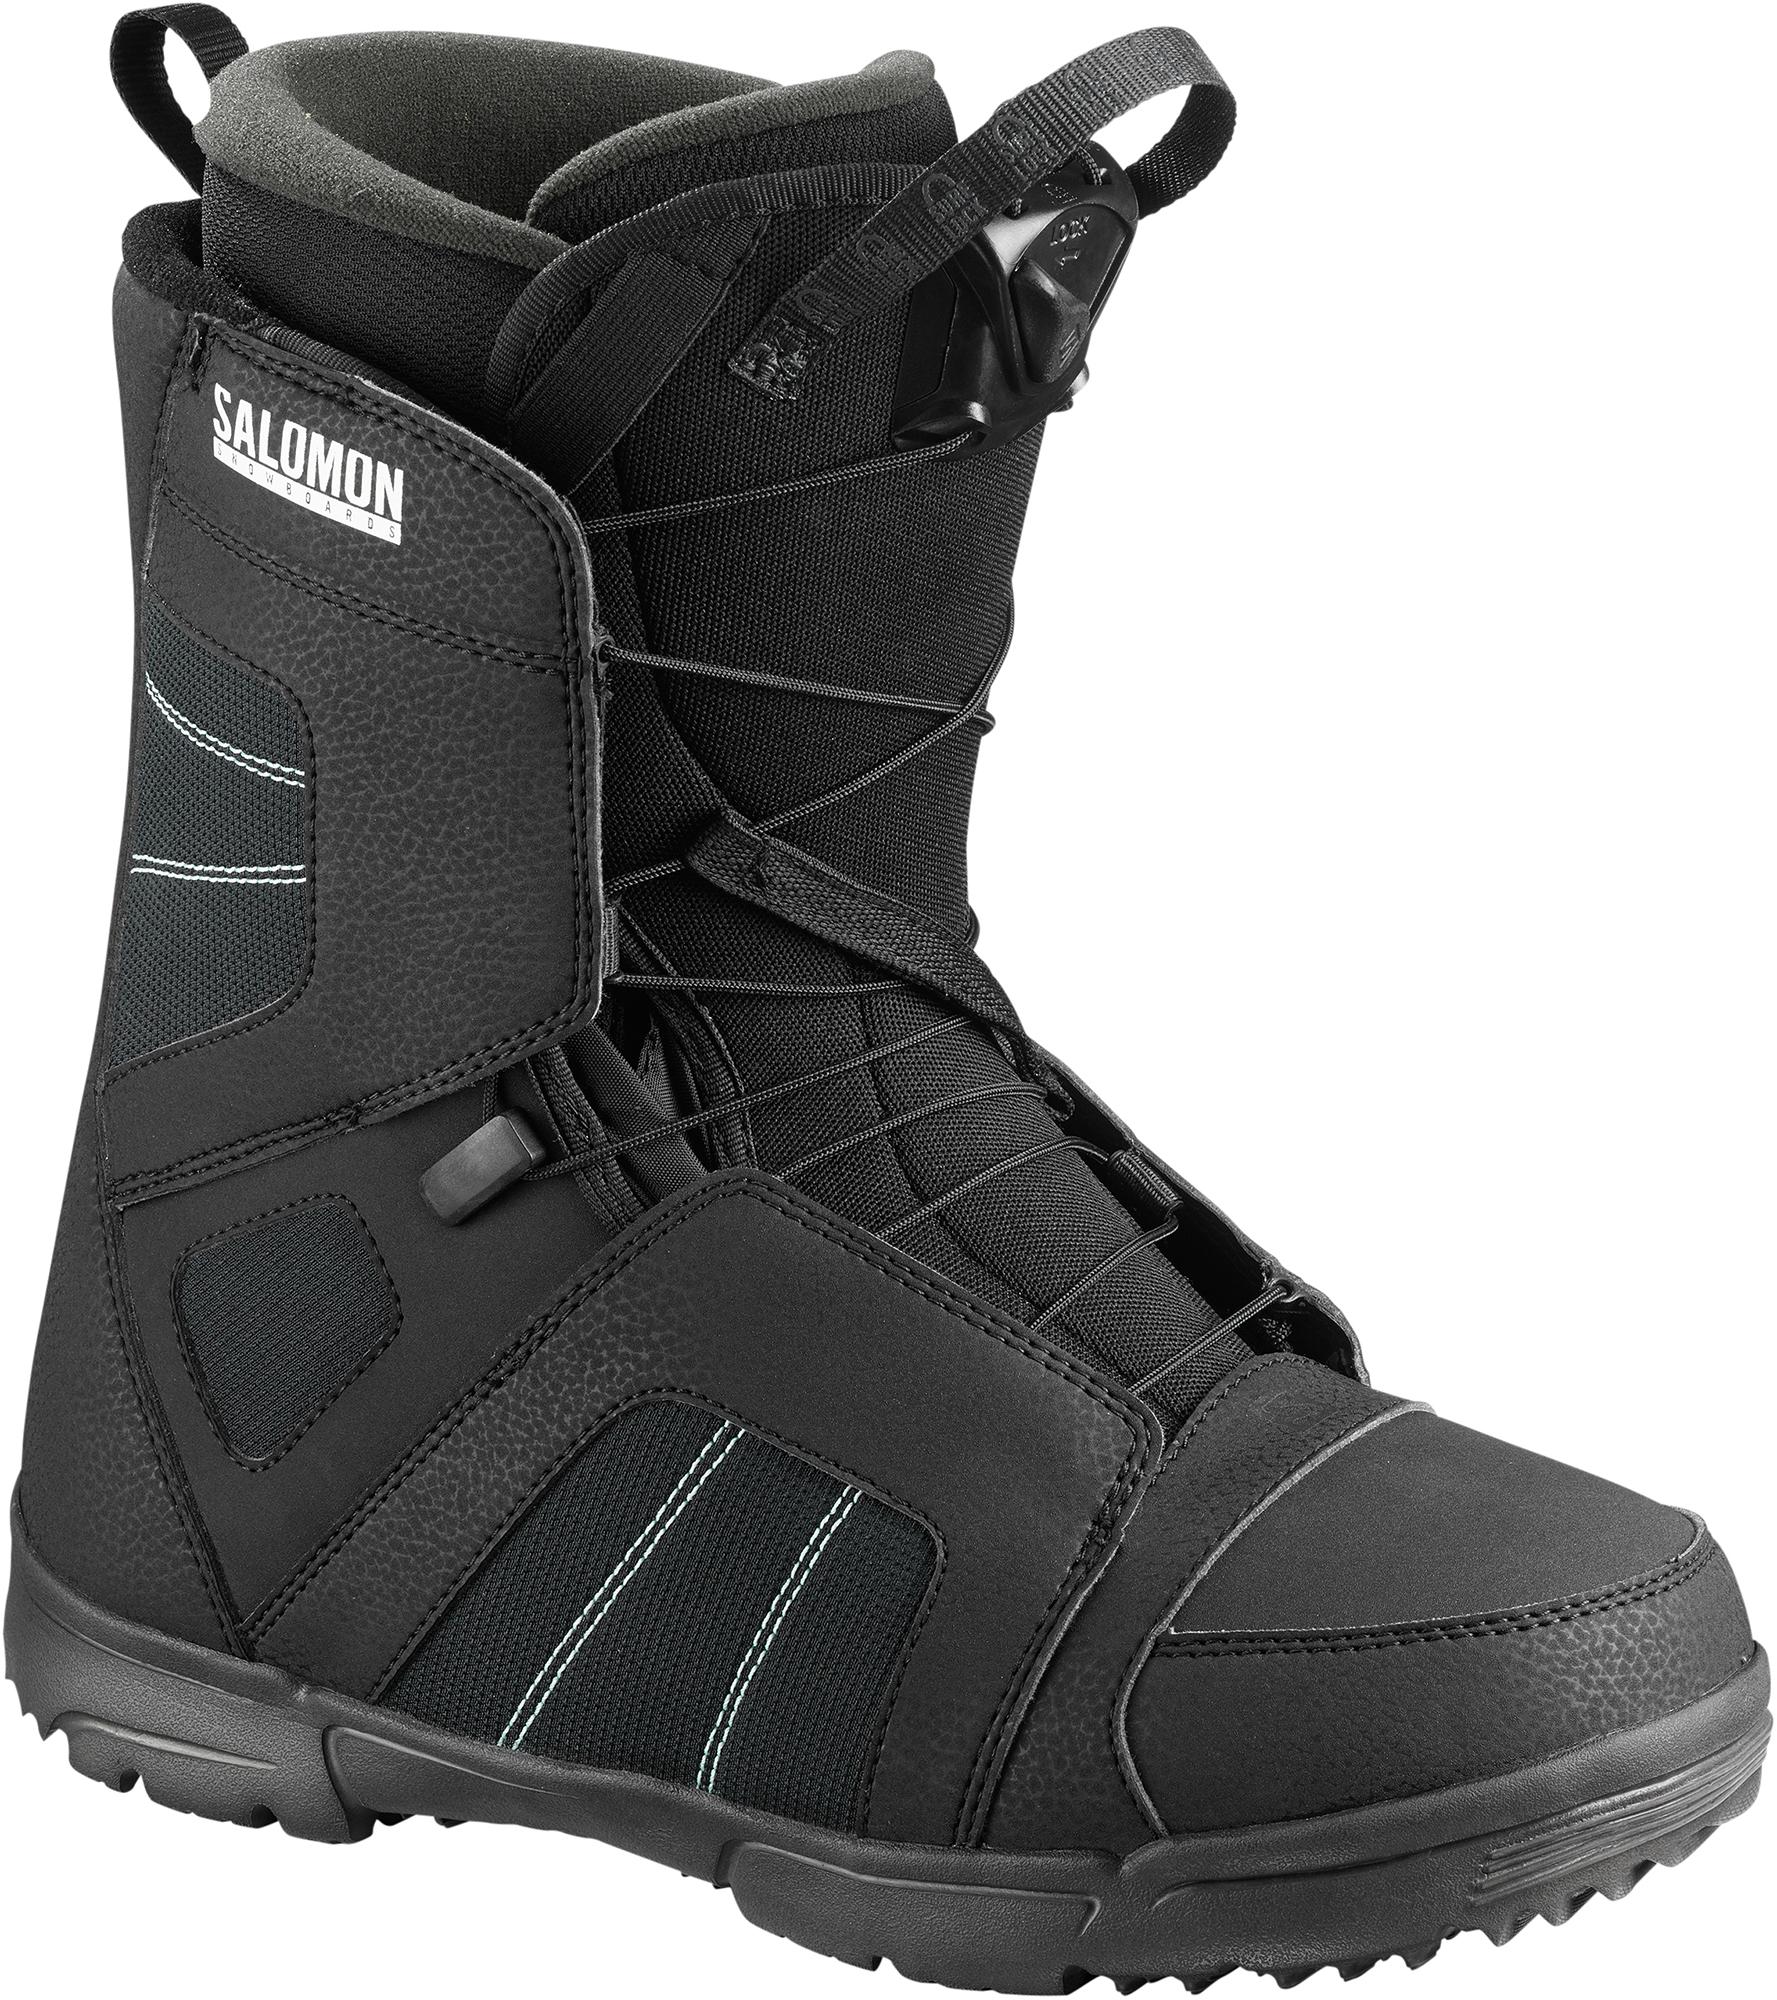 Salomon Сноубордические ботинки Salomon Titan, размер 42,5